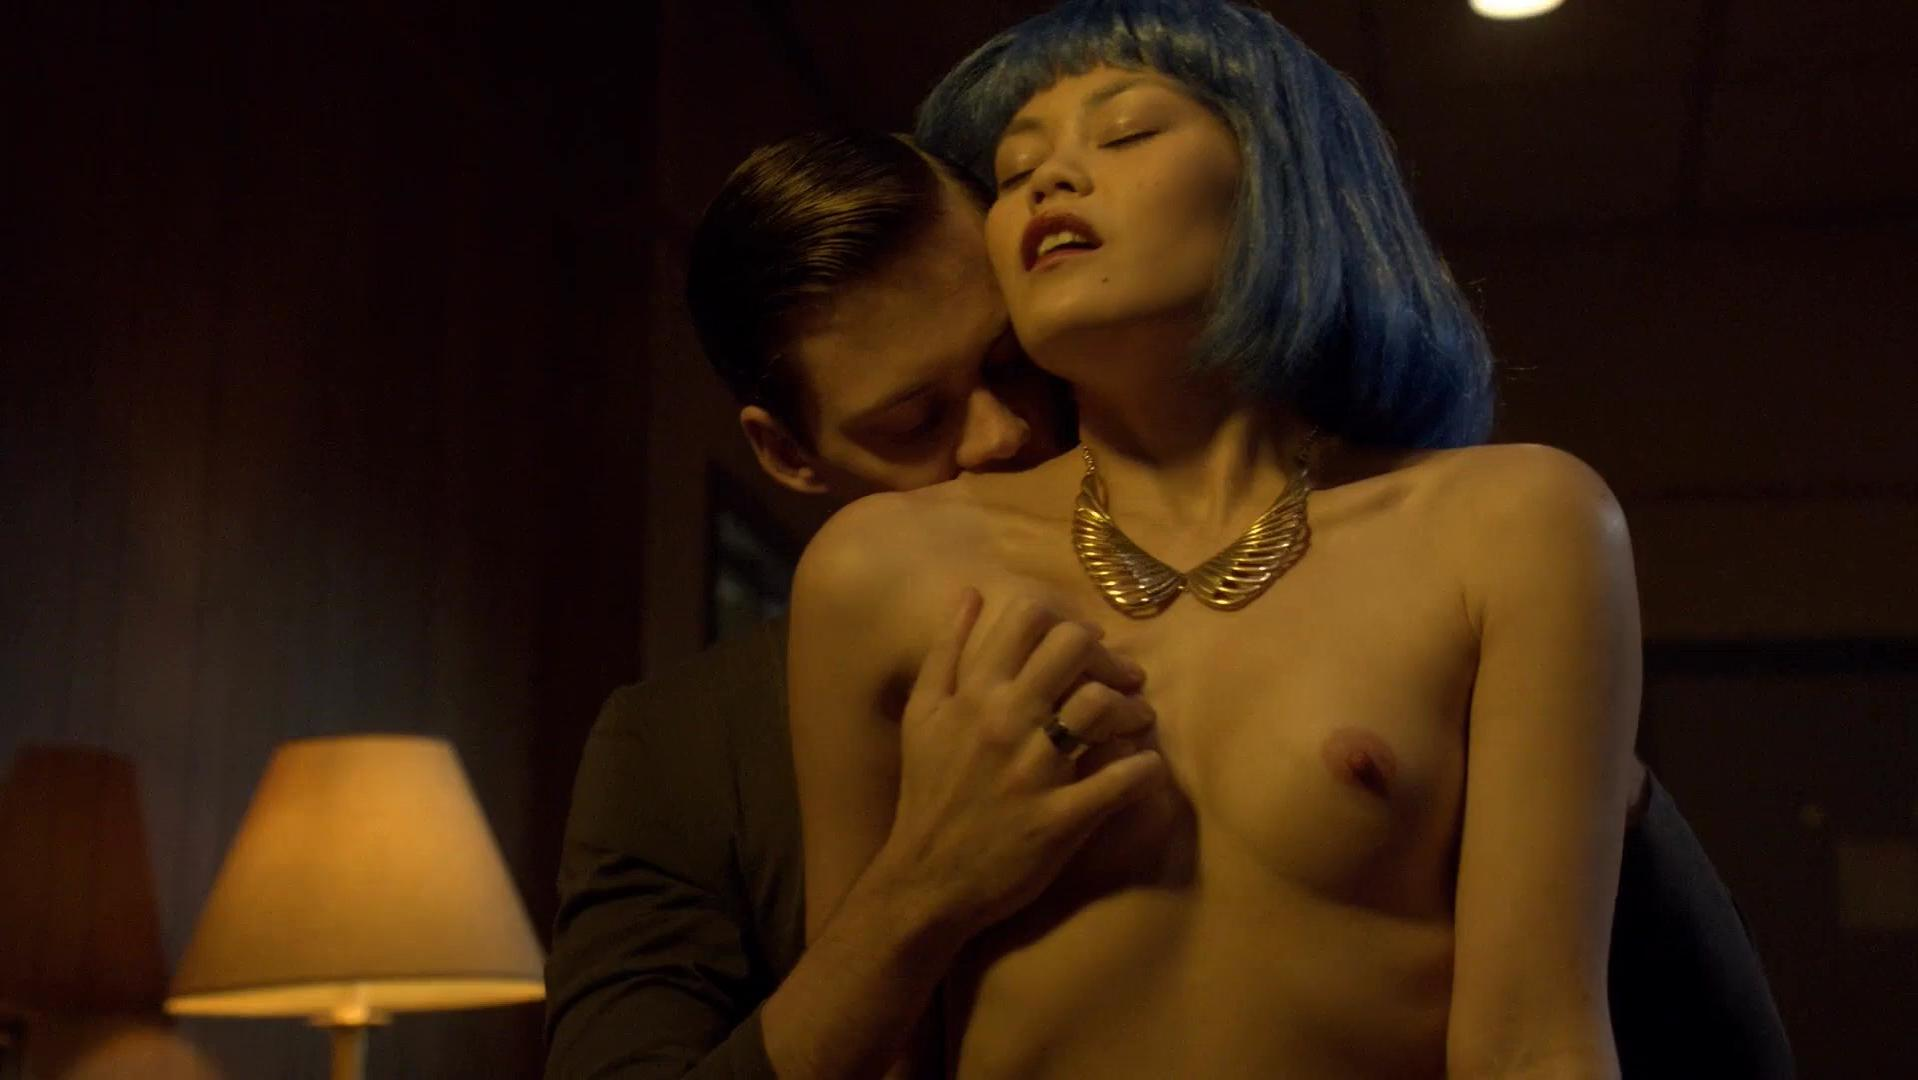 Loretta Yu nude - Hemlock Grove s02e02 (2014)